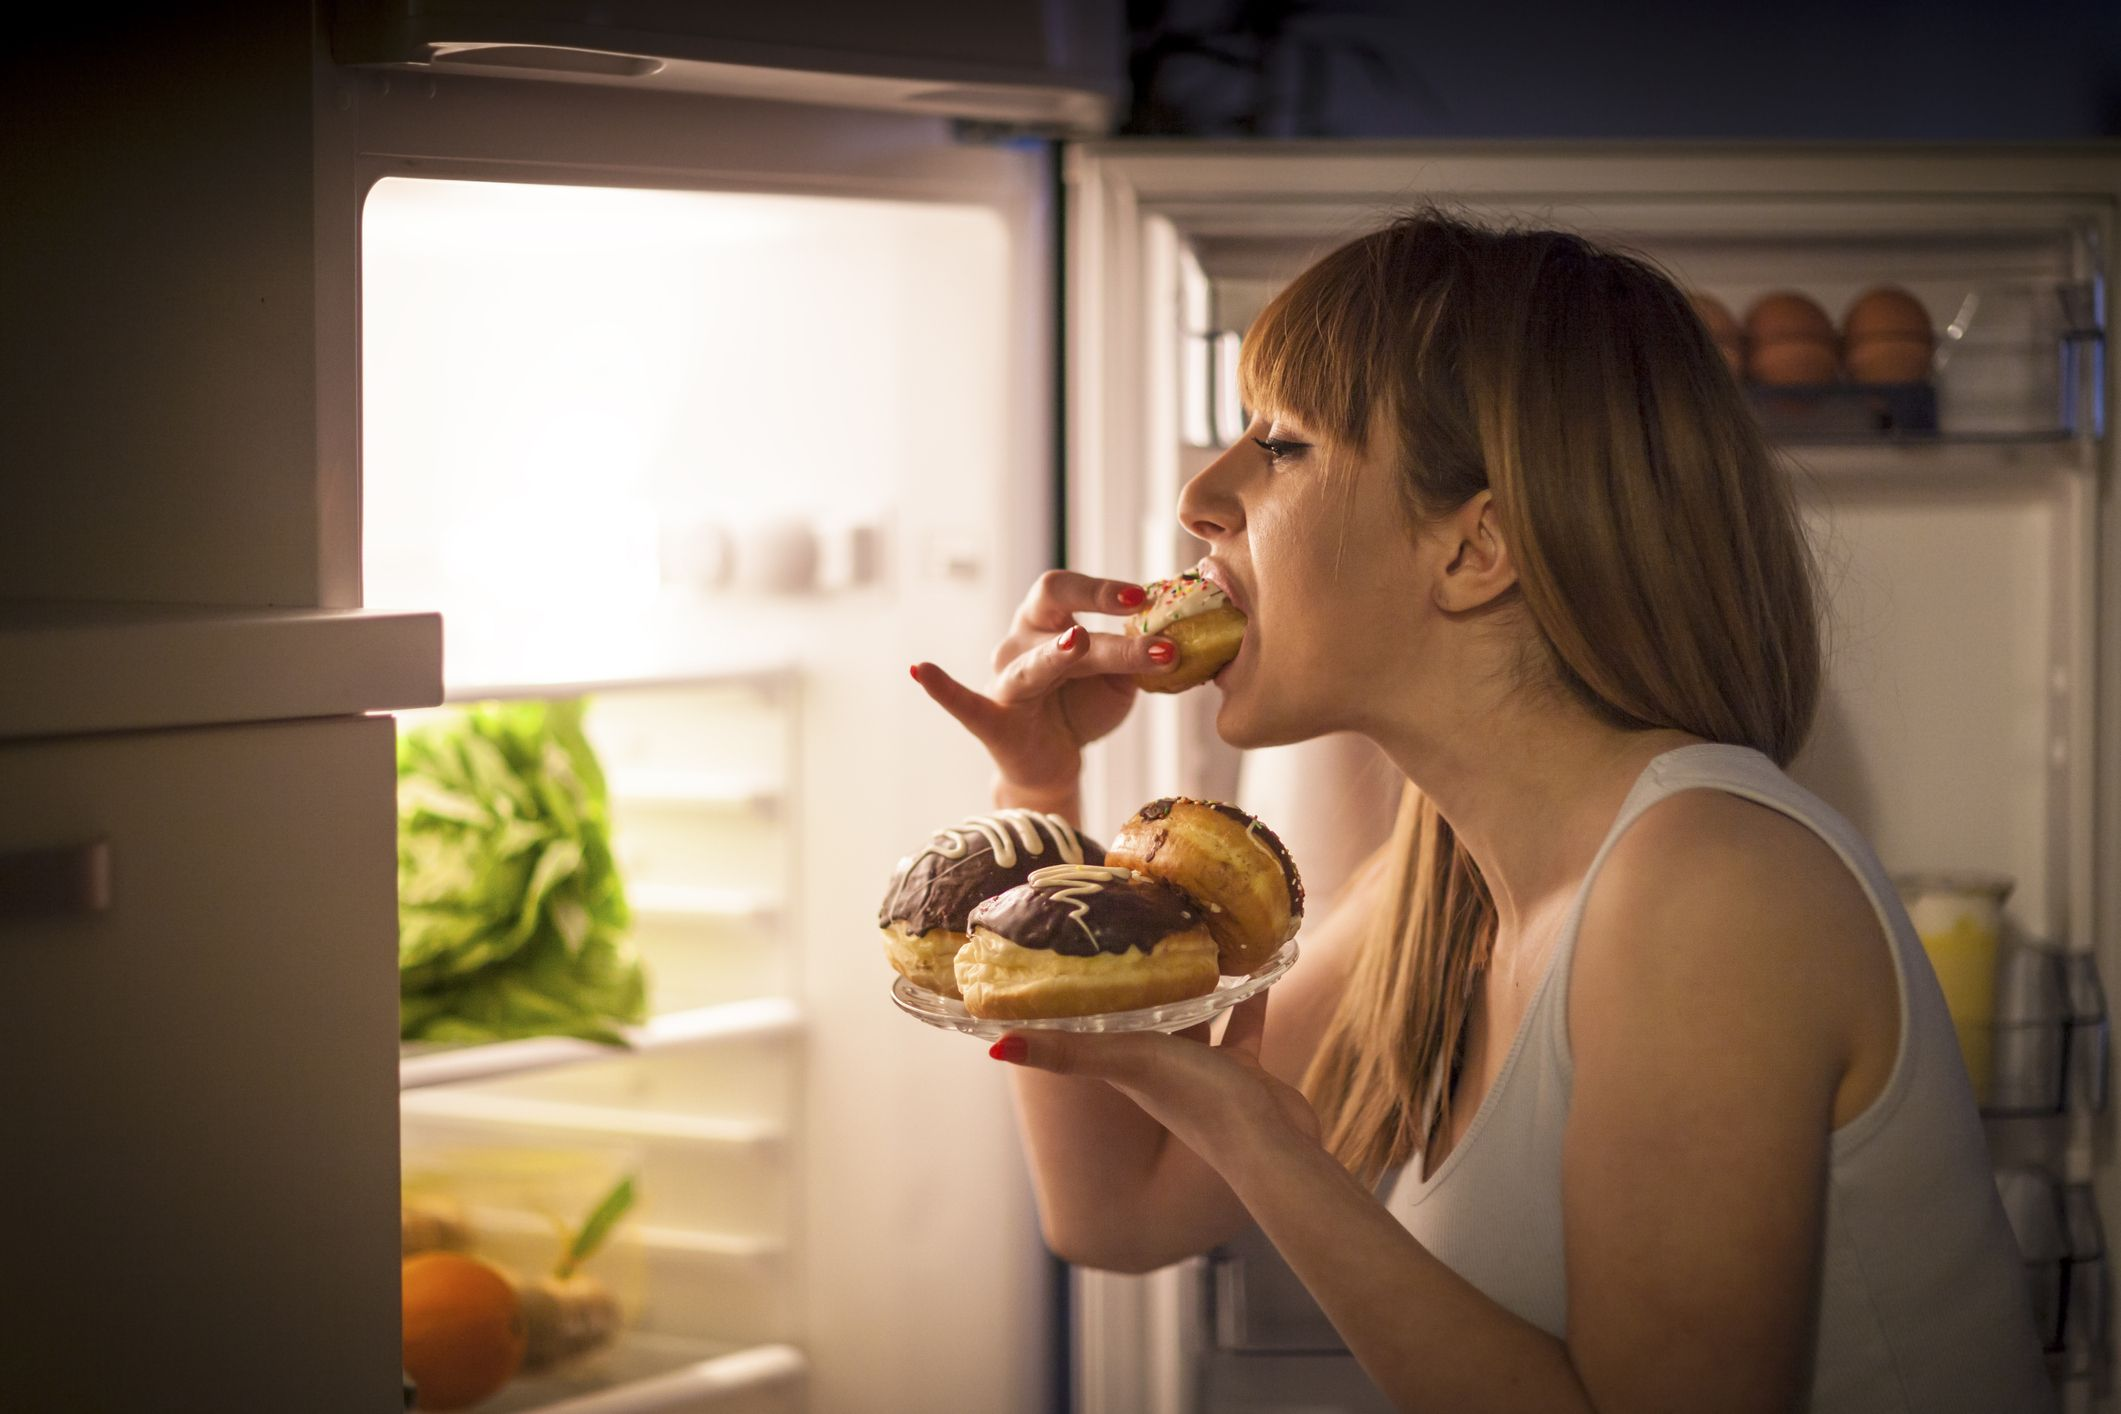 Woman eating away unpleasant emotions